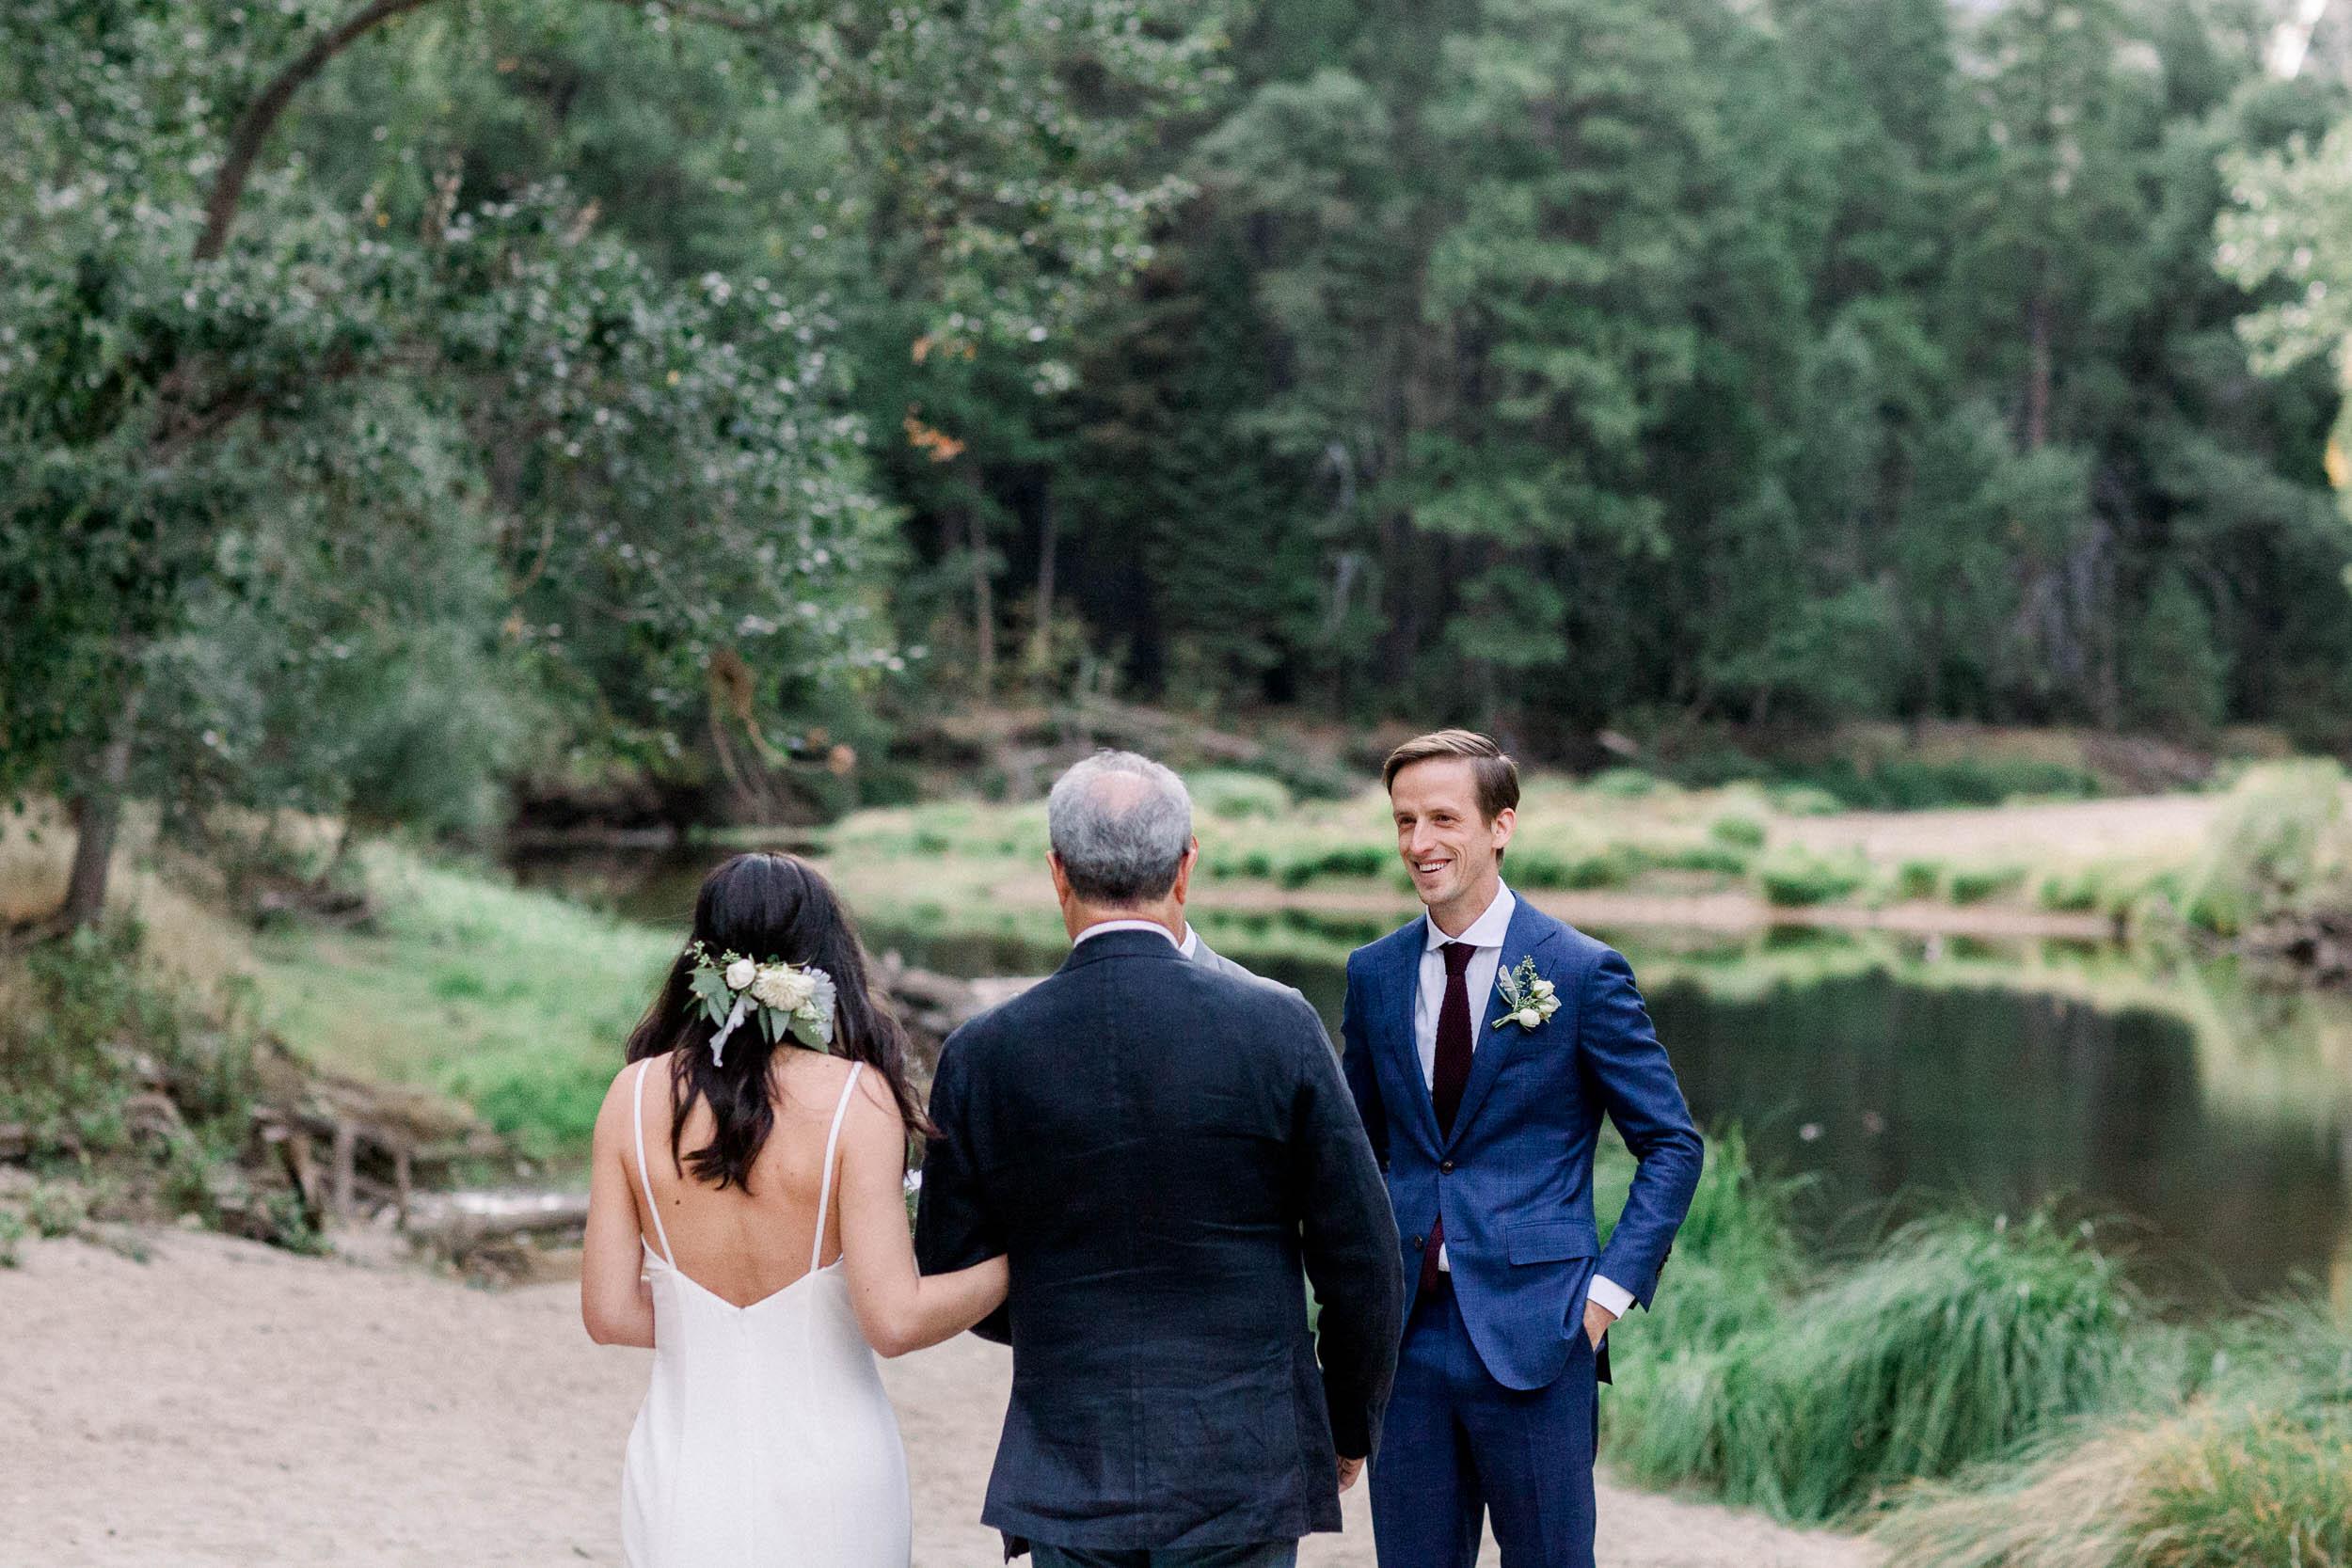 Intimate Yosemite Wedding_Buena Lane Photography_091318ER255-2.jpg